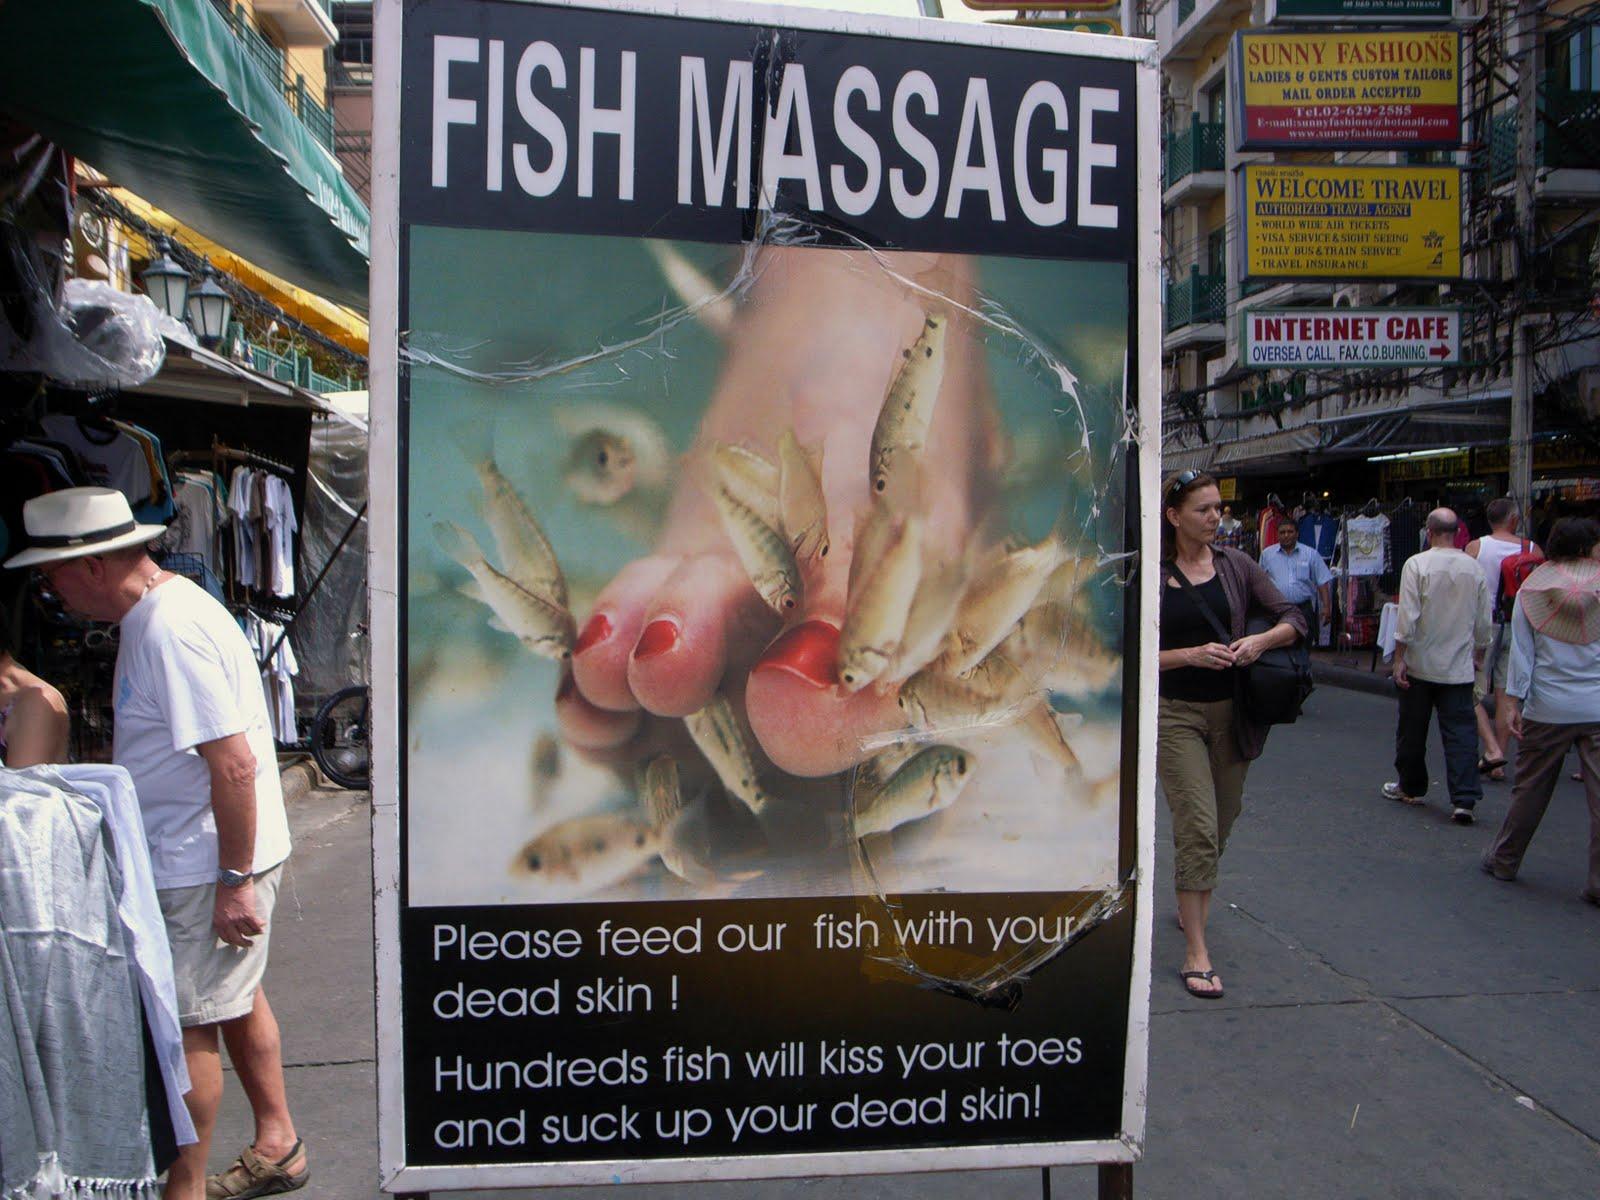 Fish%2BMassage%2BKhao%2BSan%2BI 【TOONDRA Comics Free/Adult/Acti】屏幕截图